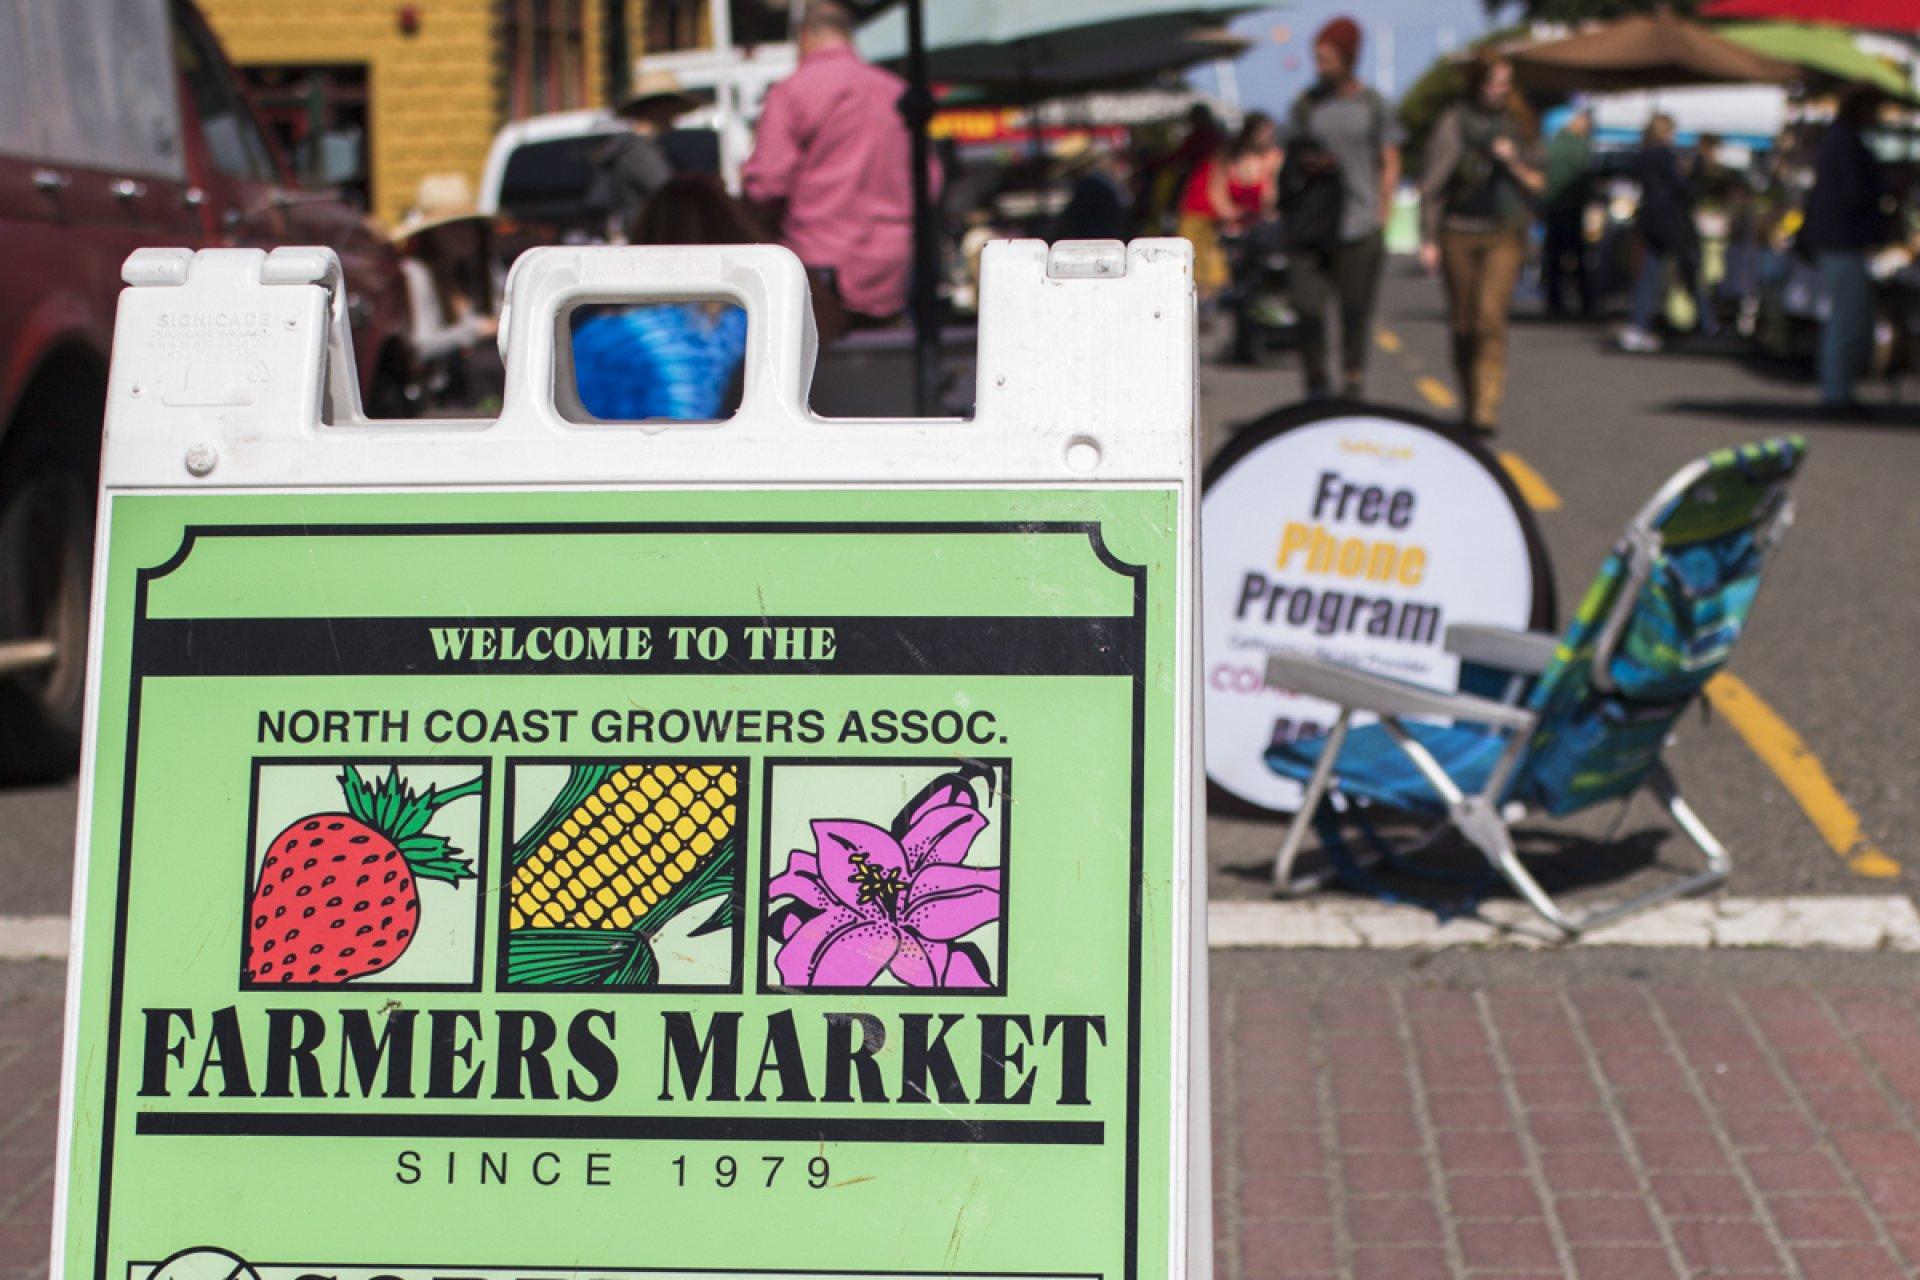 Sign outside the Farmers Market. Photo credit: Lauren Shea